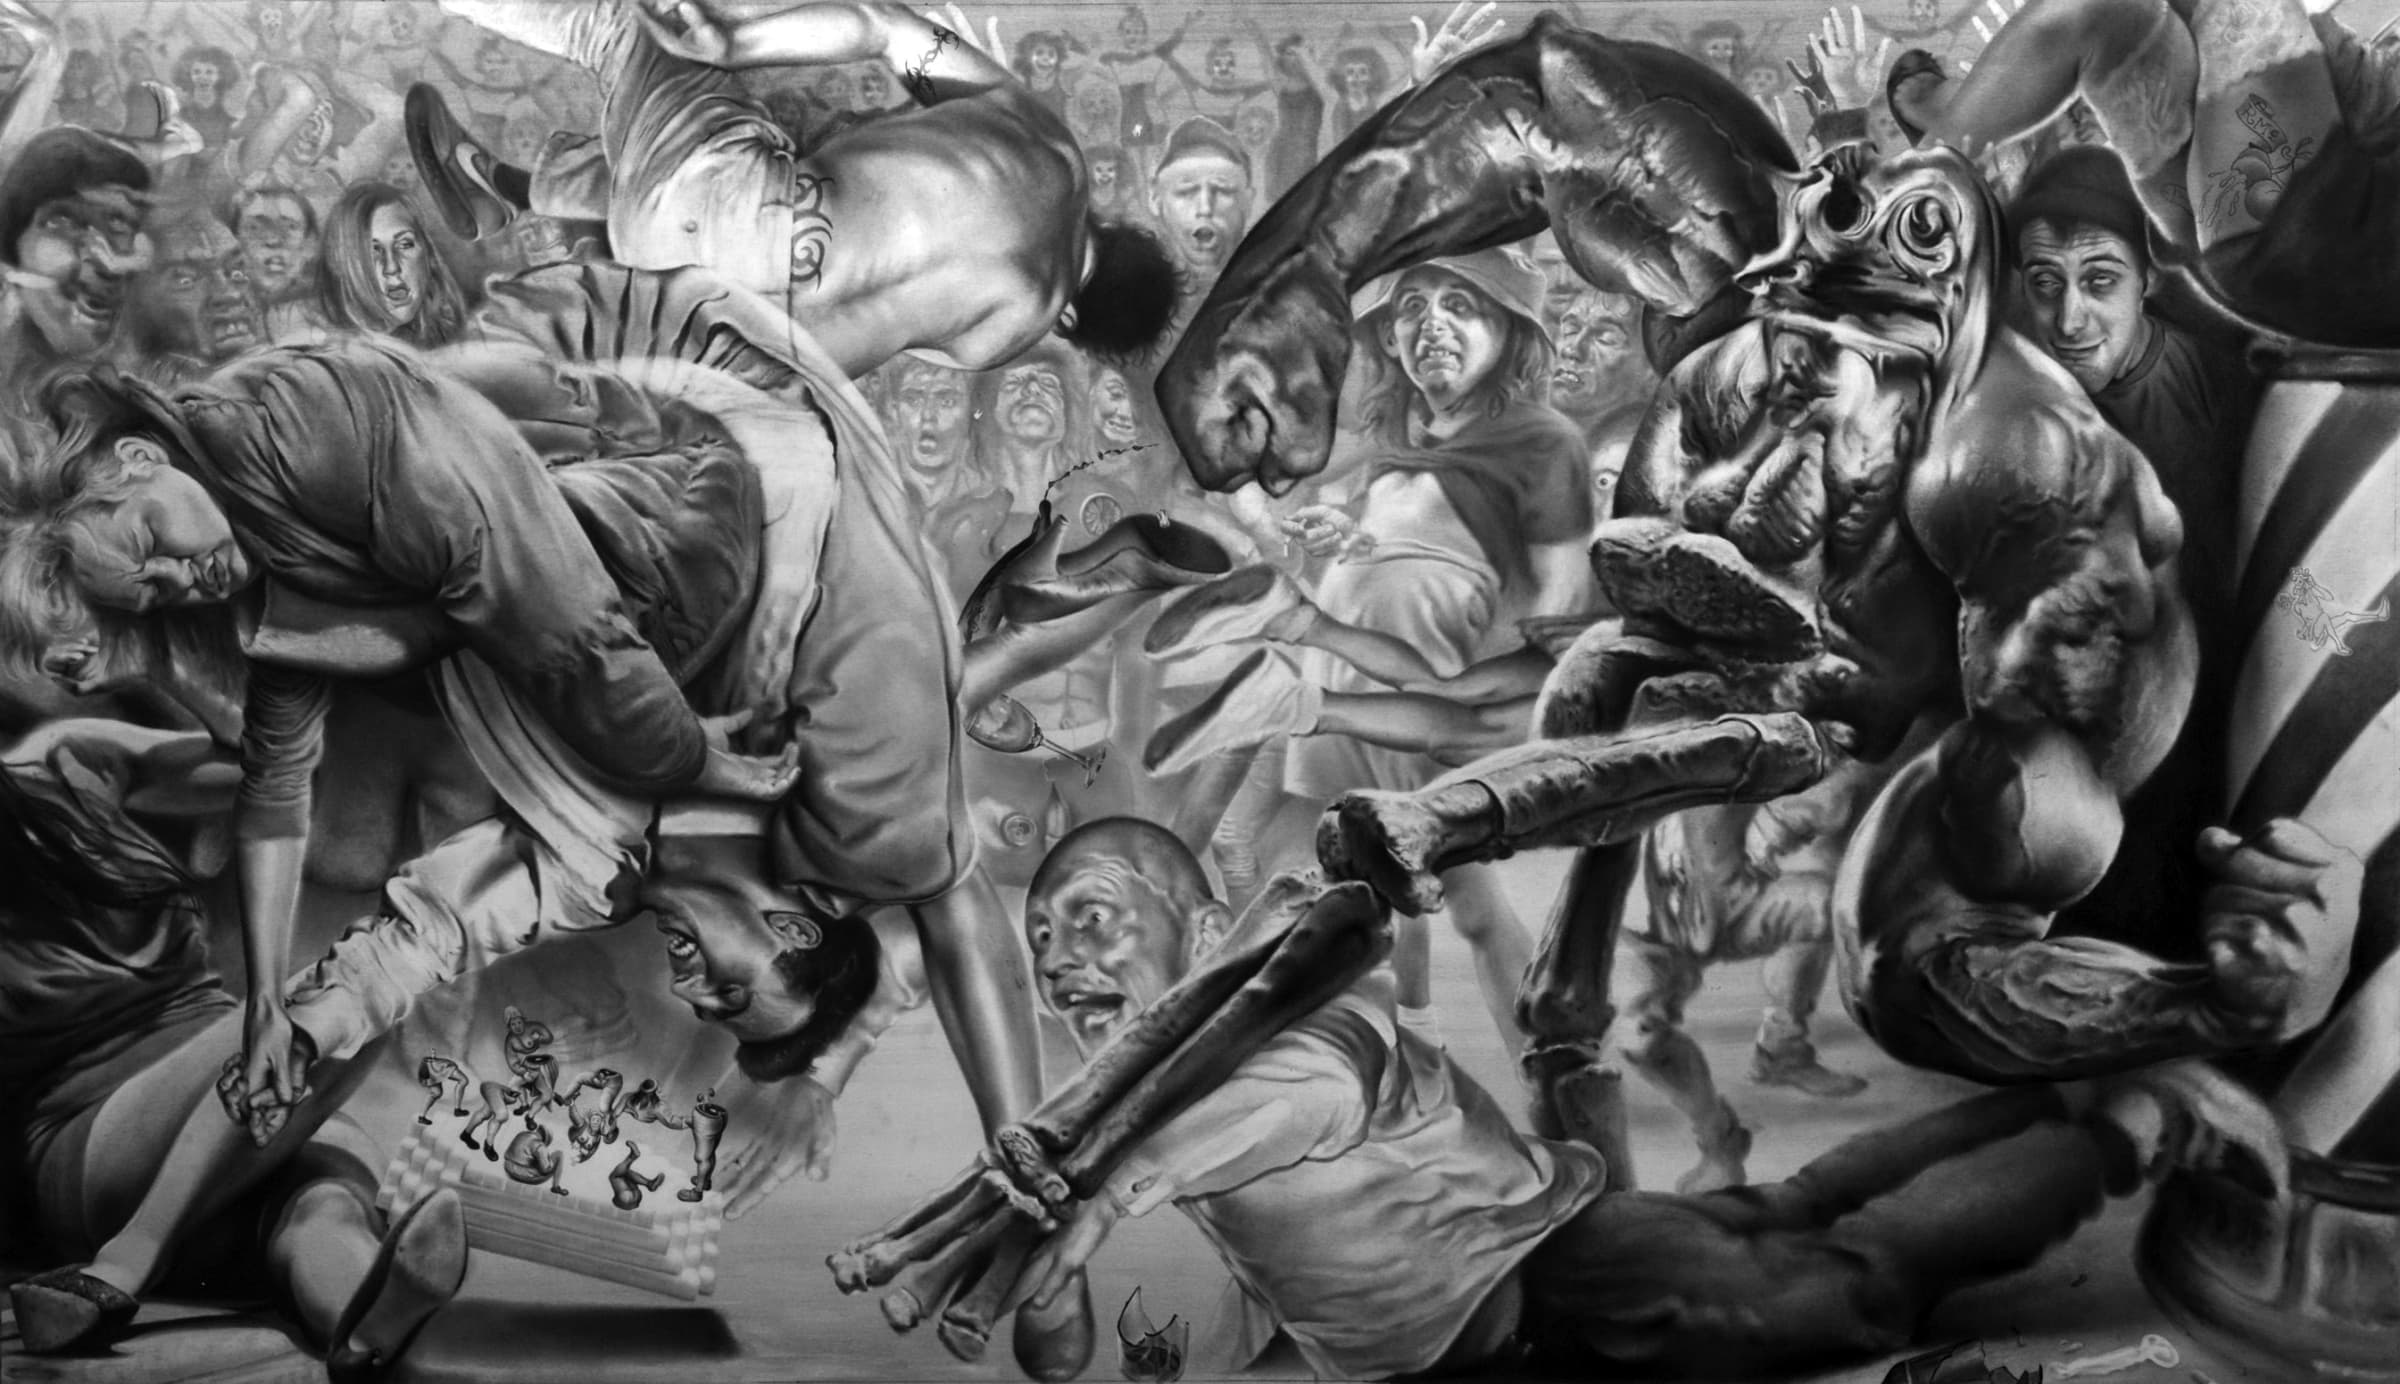 <span class=&#34;link fancybox-details-link&#34;><a href=&#34;/exhibitions/98/works/image1949/&#34;>View Detail Page</a></span><p><em><strong>Robert McNally </strong><em>Blackeye Fridays </em>2016<em><br /></em>Graphite on paper, 55cm x 92cm<br />Courtesy of David Risley gallery Copenhagen</em></p><p><em>&#160;</em></p>